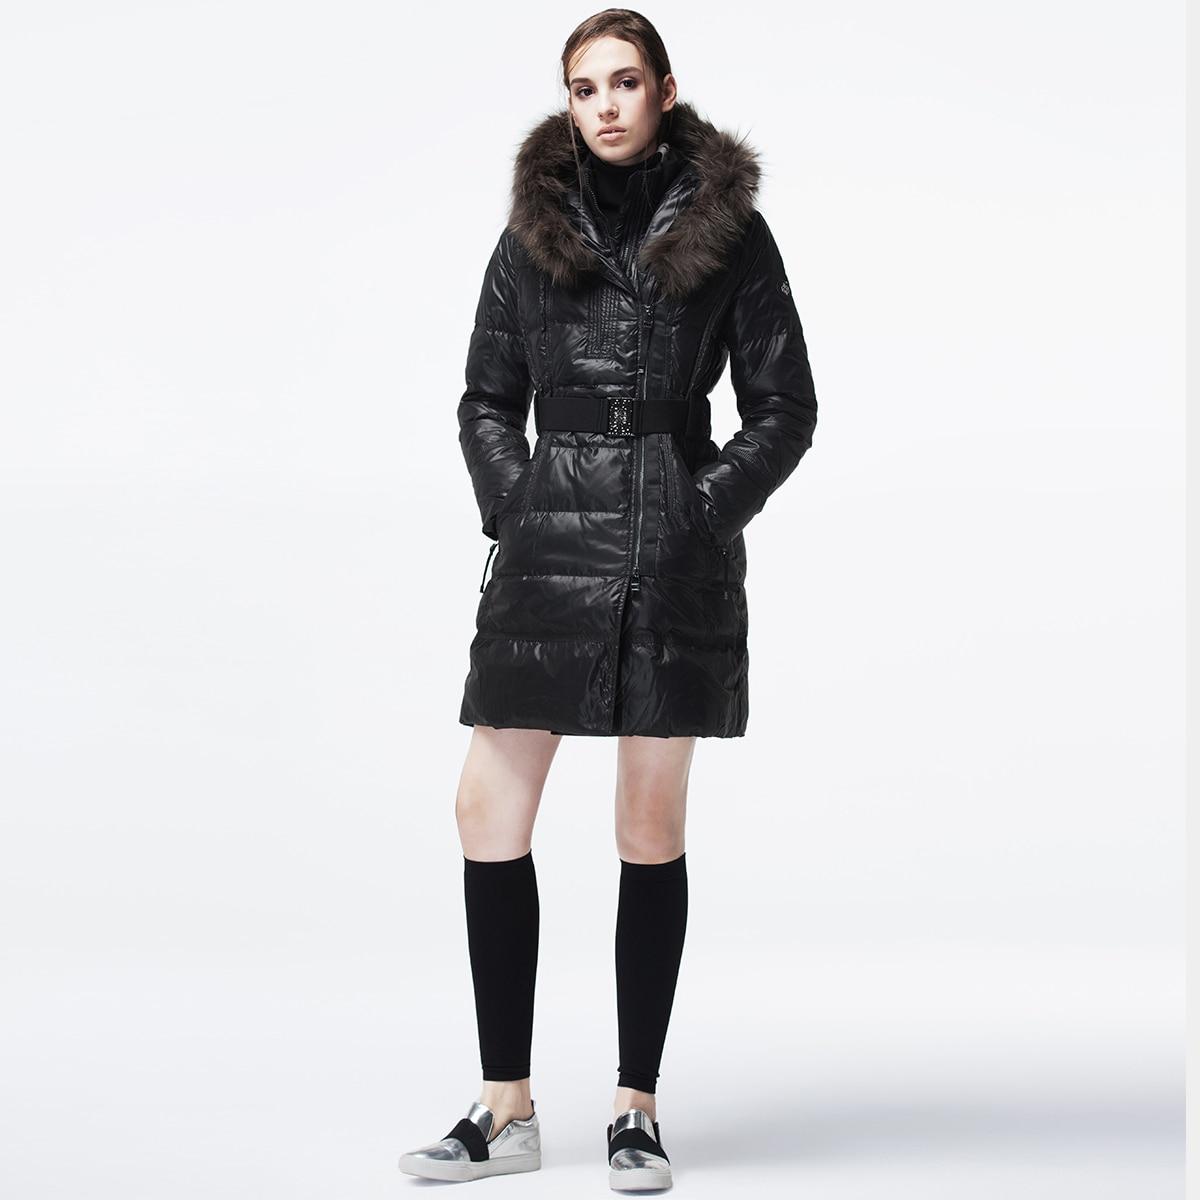 Autumn Winter Jacket Women Fashion Women's Down Jacket Racoon Fur Collar Long Coat Female Double-necked Campera KJ553